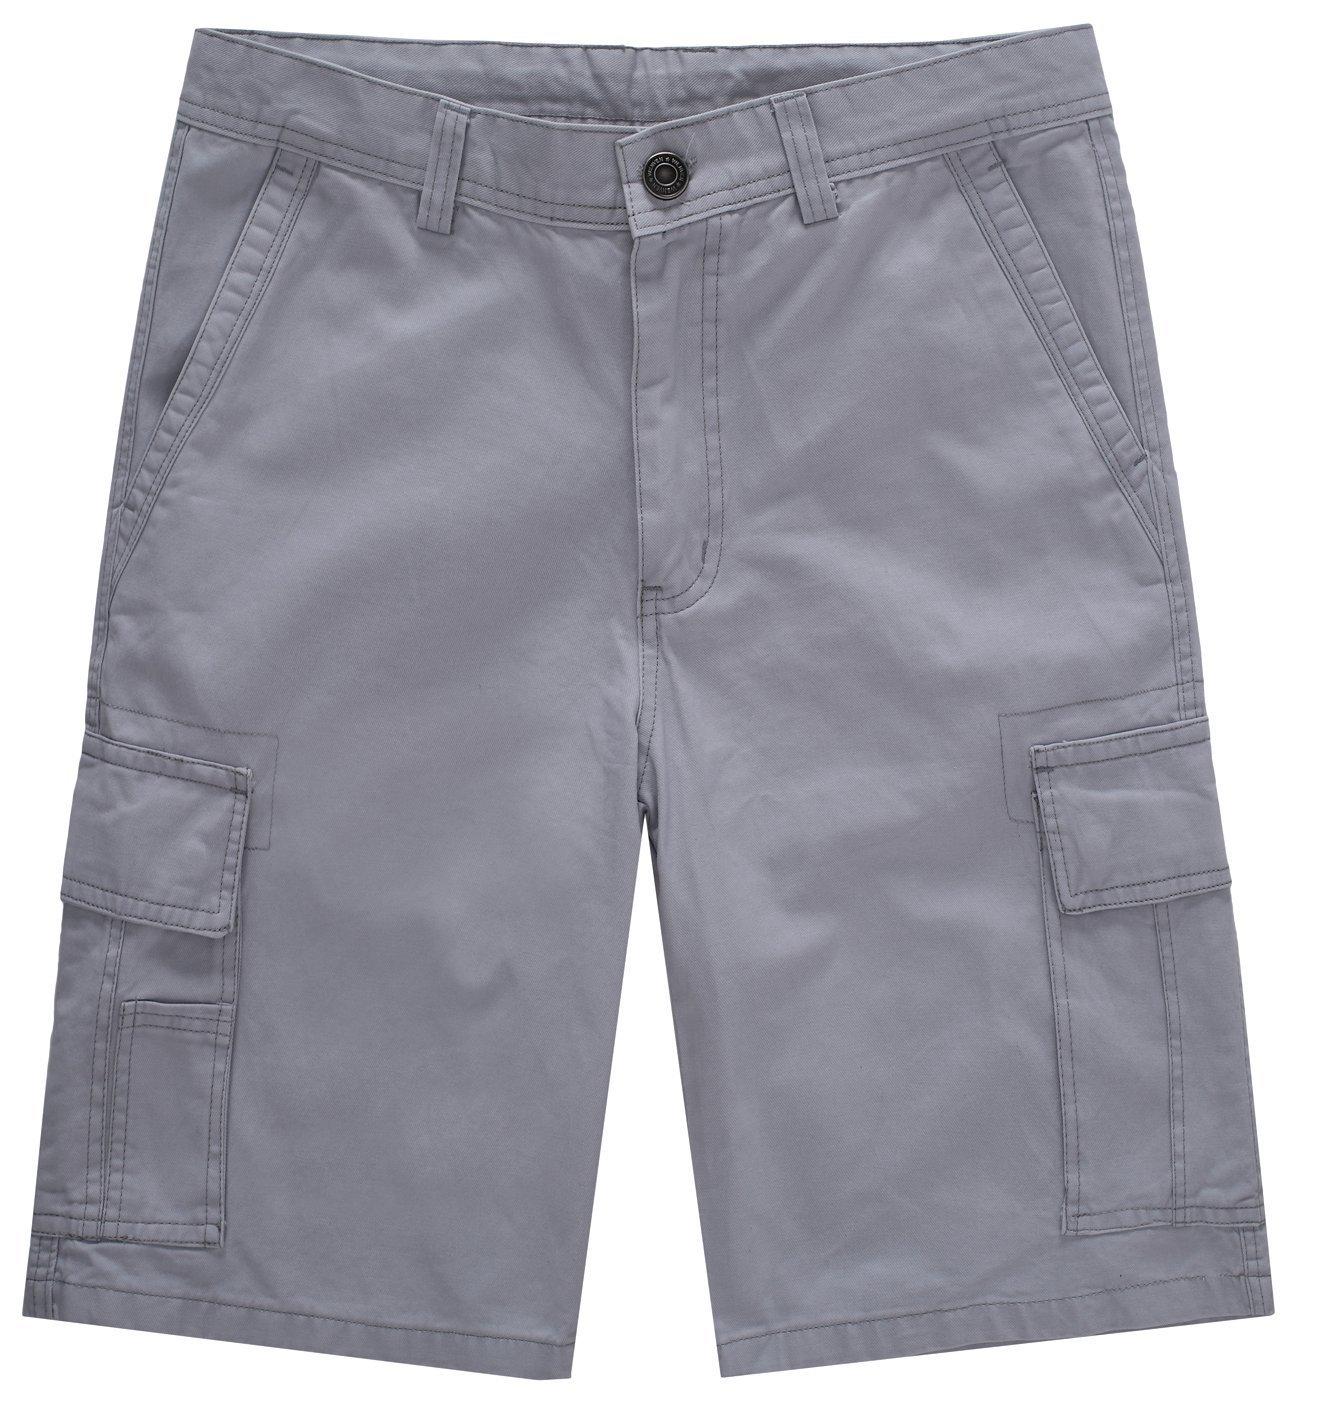 WenVen Men's Loose Fit Cotton Twill Cargo Short, Light Grey, 44